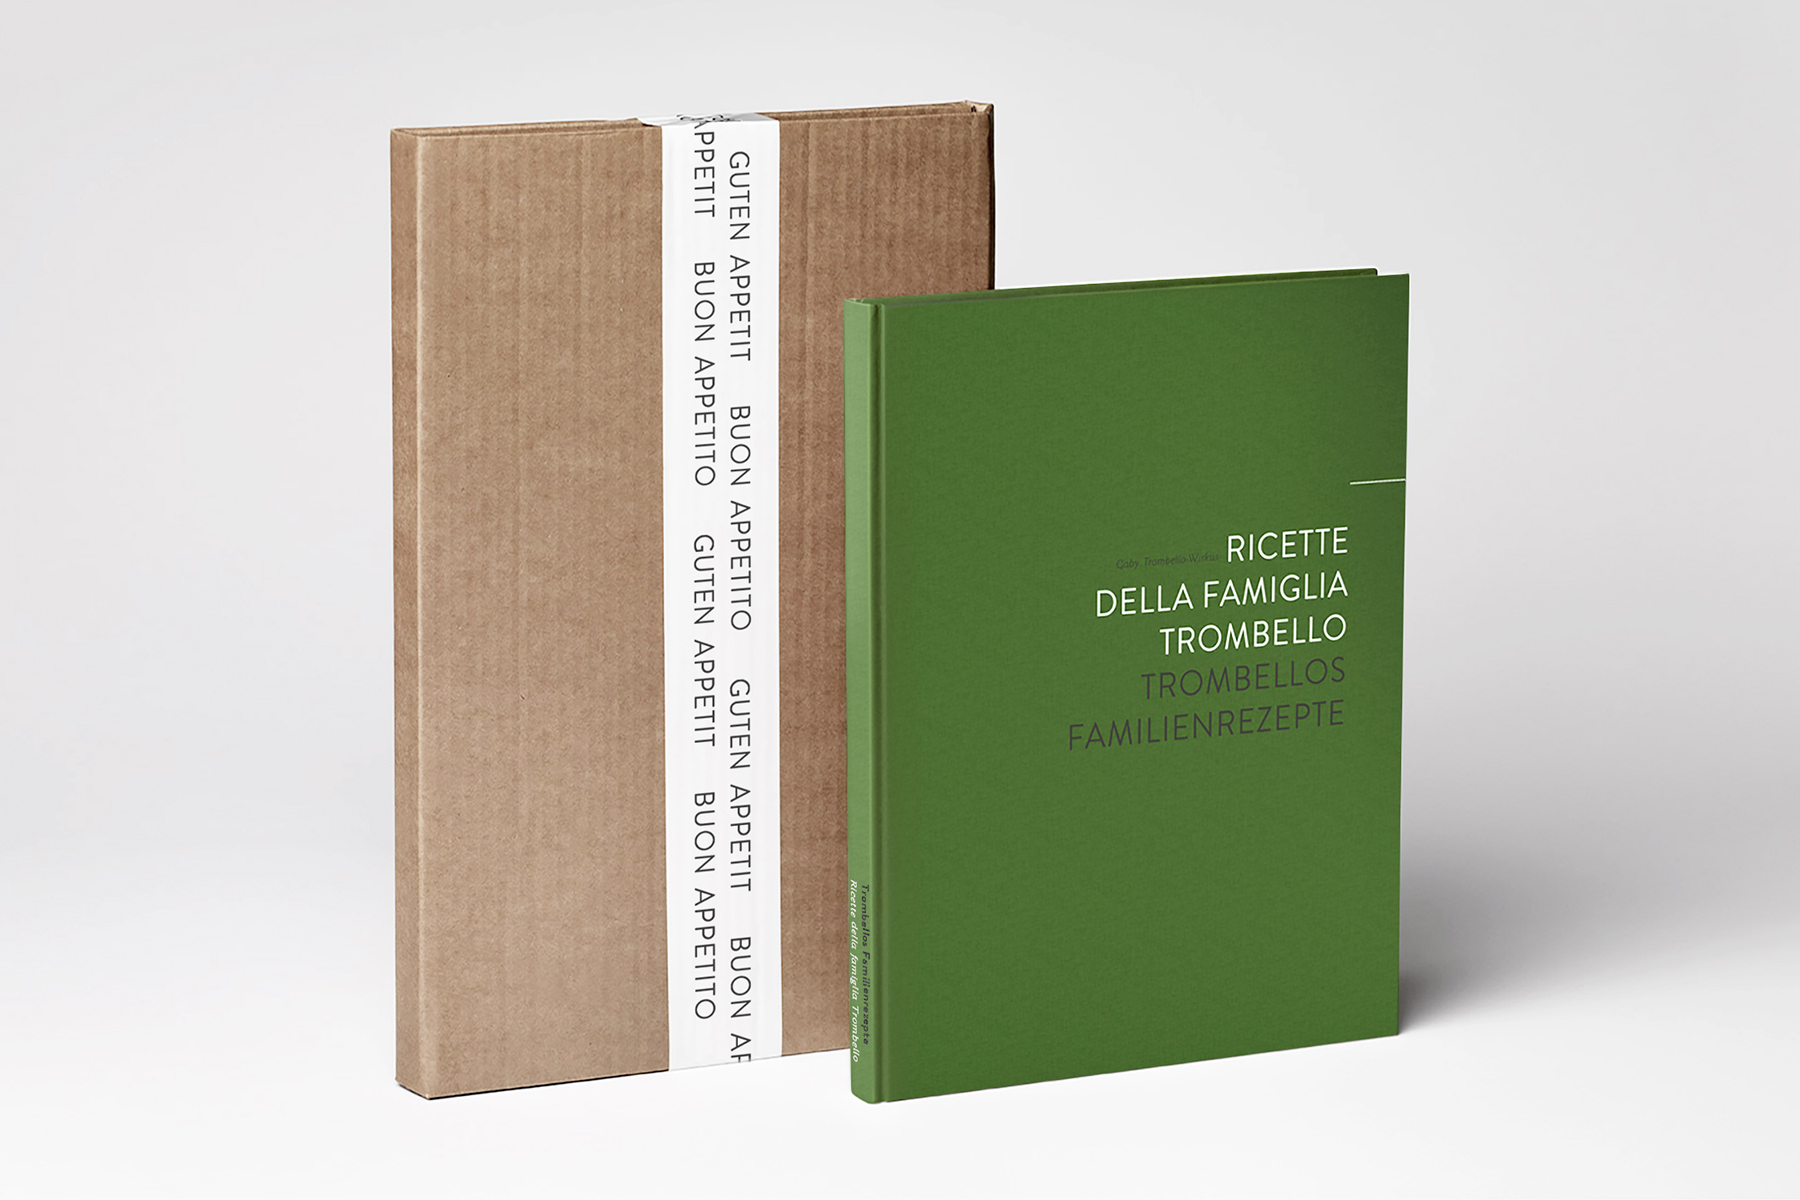 Trombello's Familienrezepte / Buchdesign